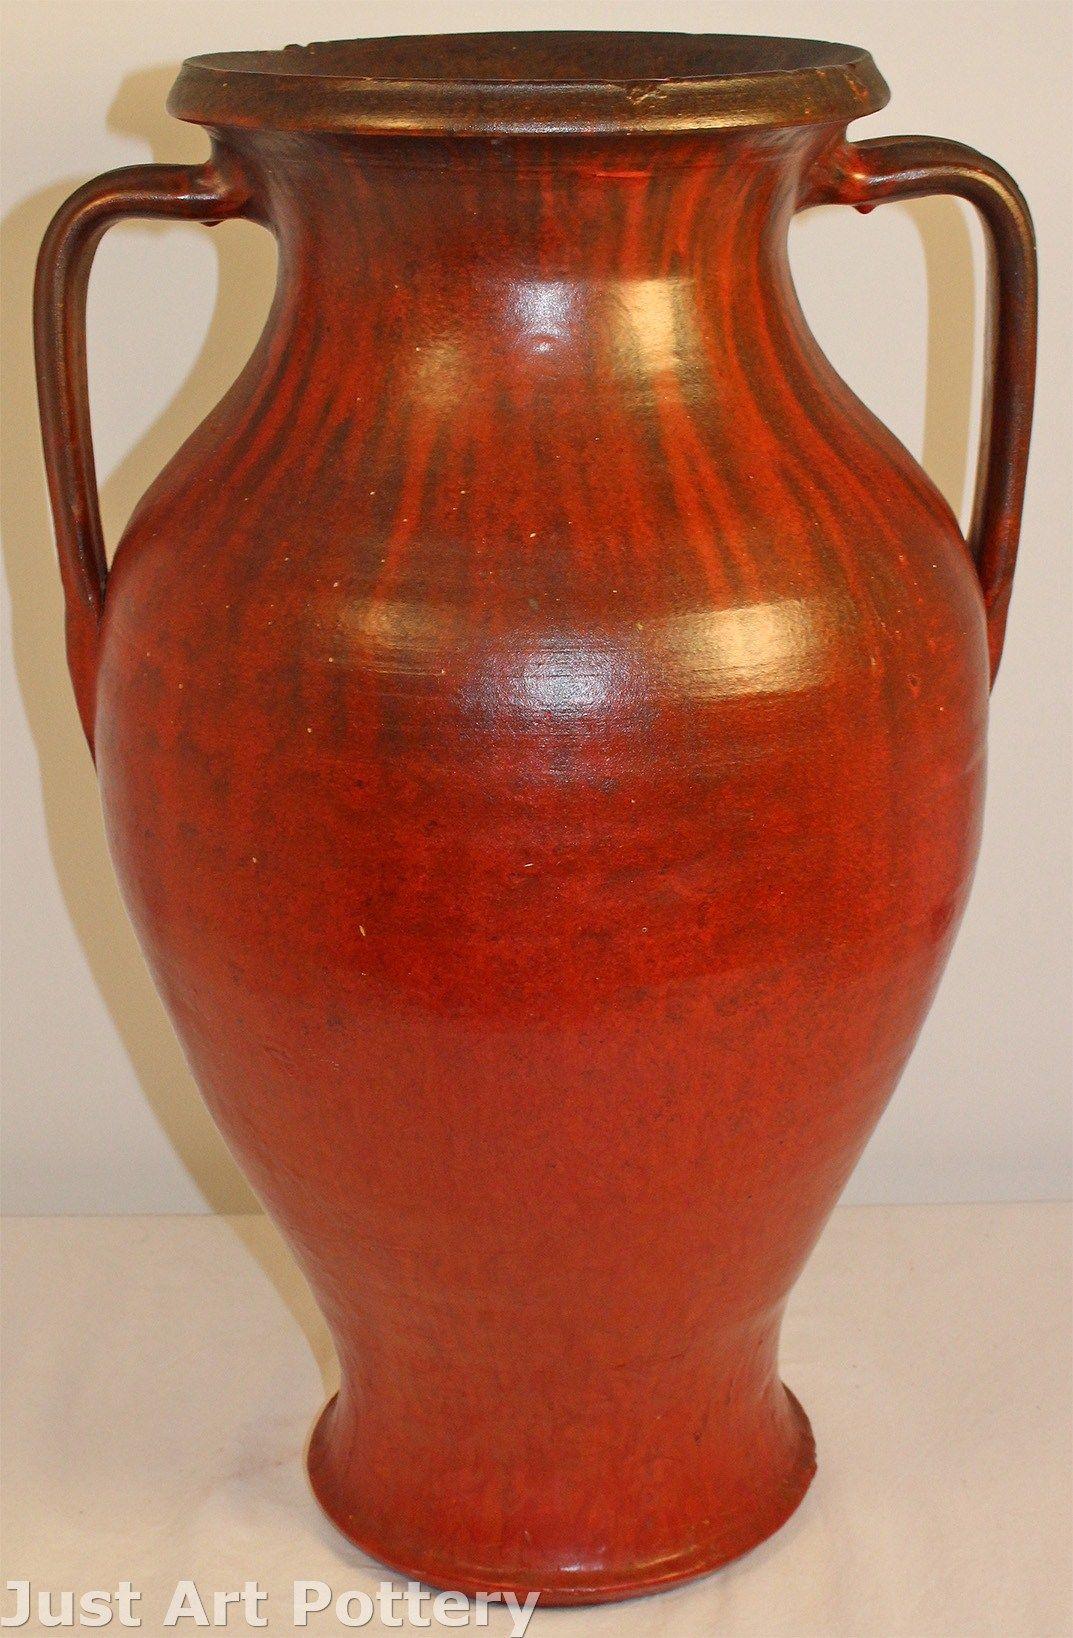 Carolina Cole Pottery Chrome Red Handled Floor Vase From Just Art Pottery Vazolar